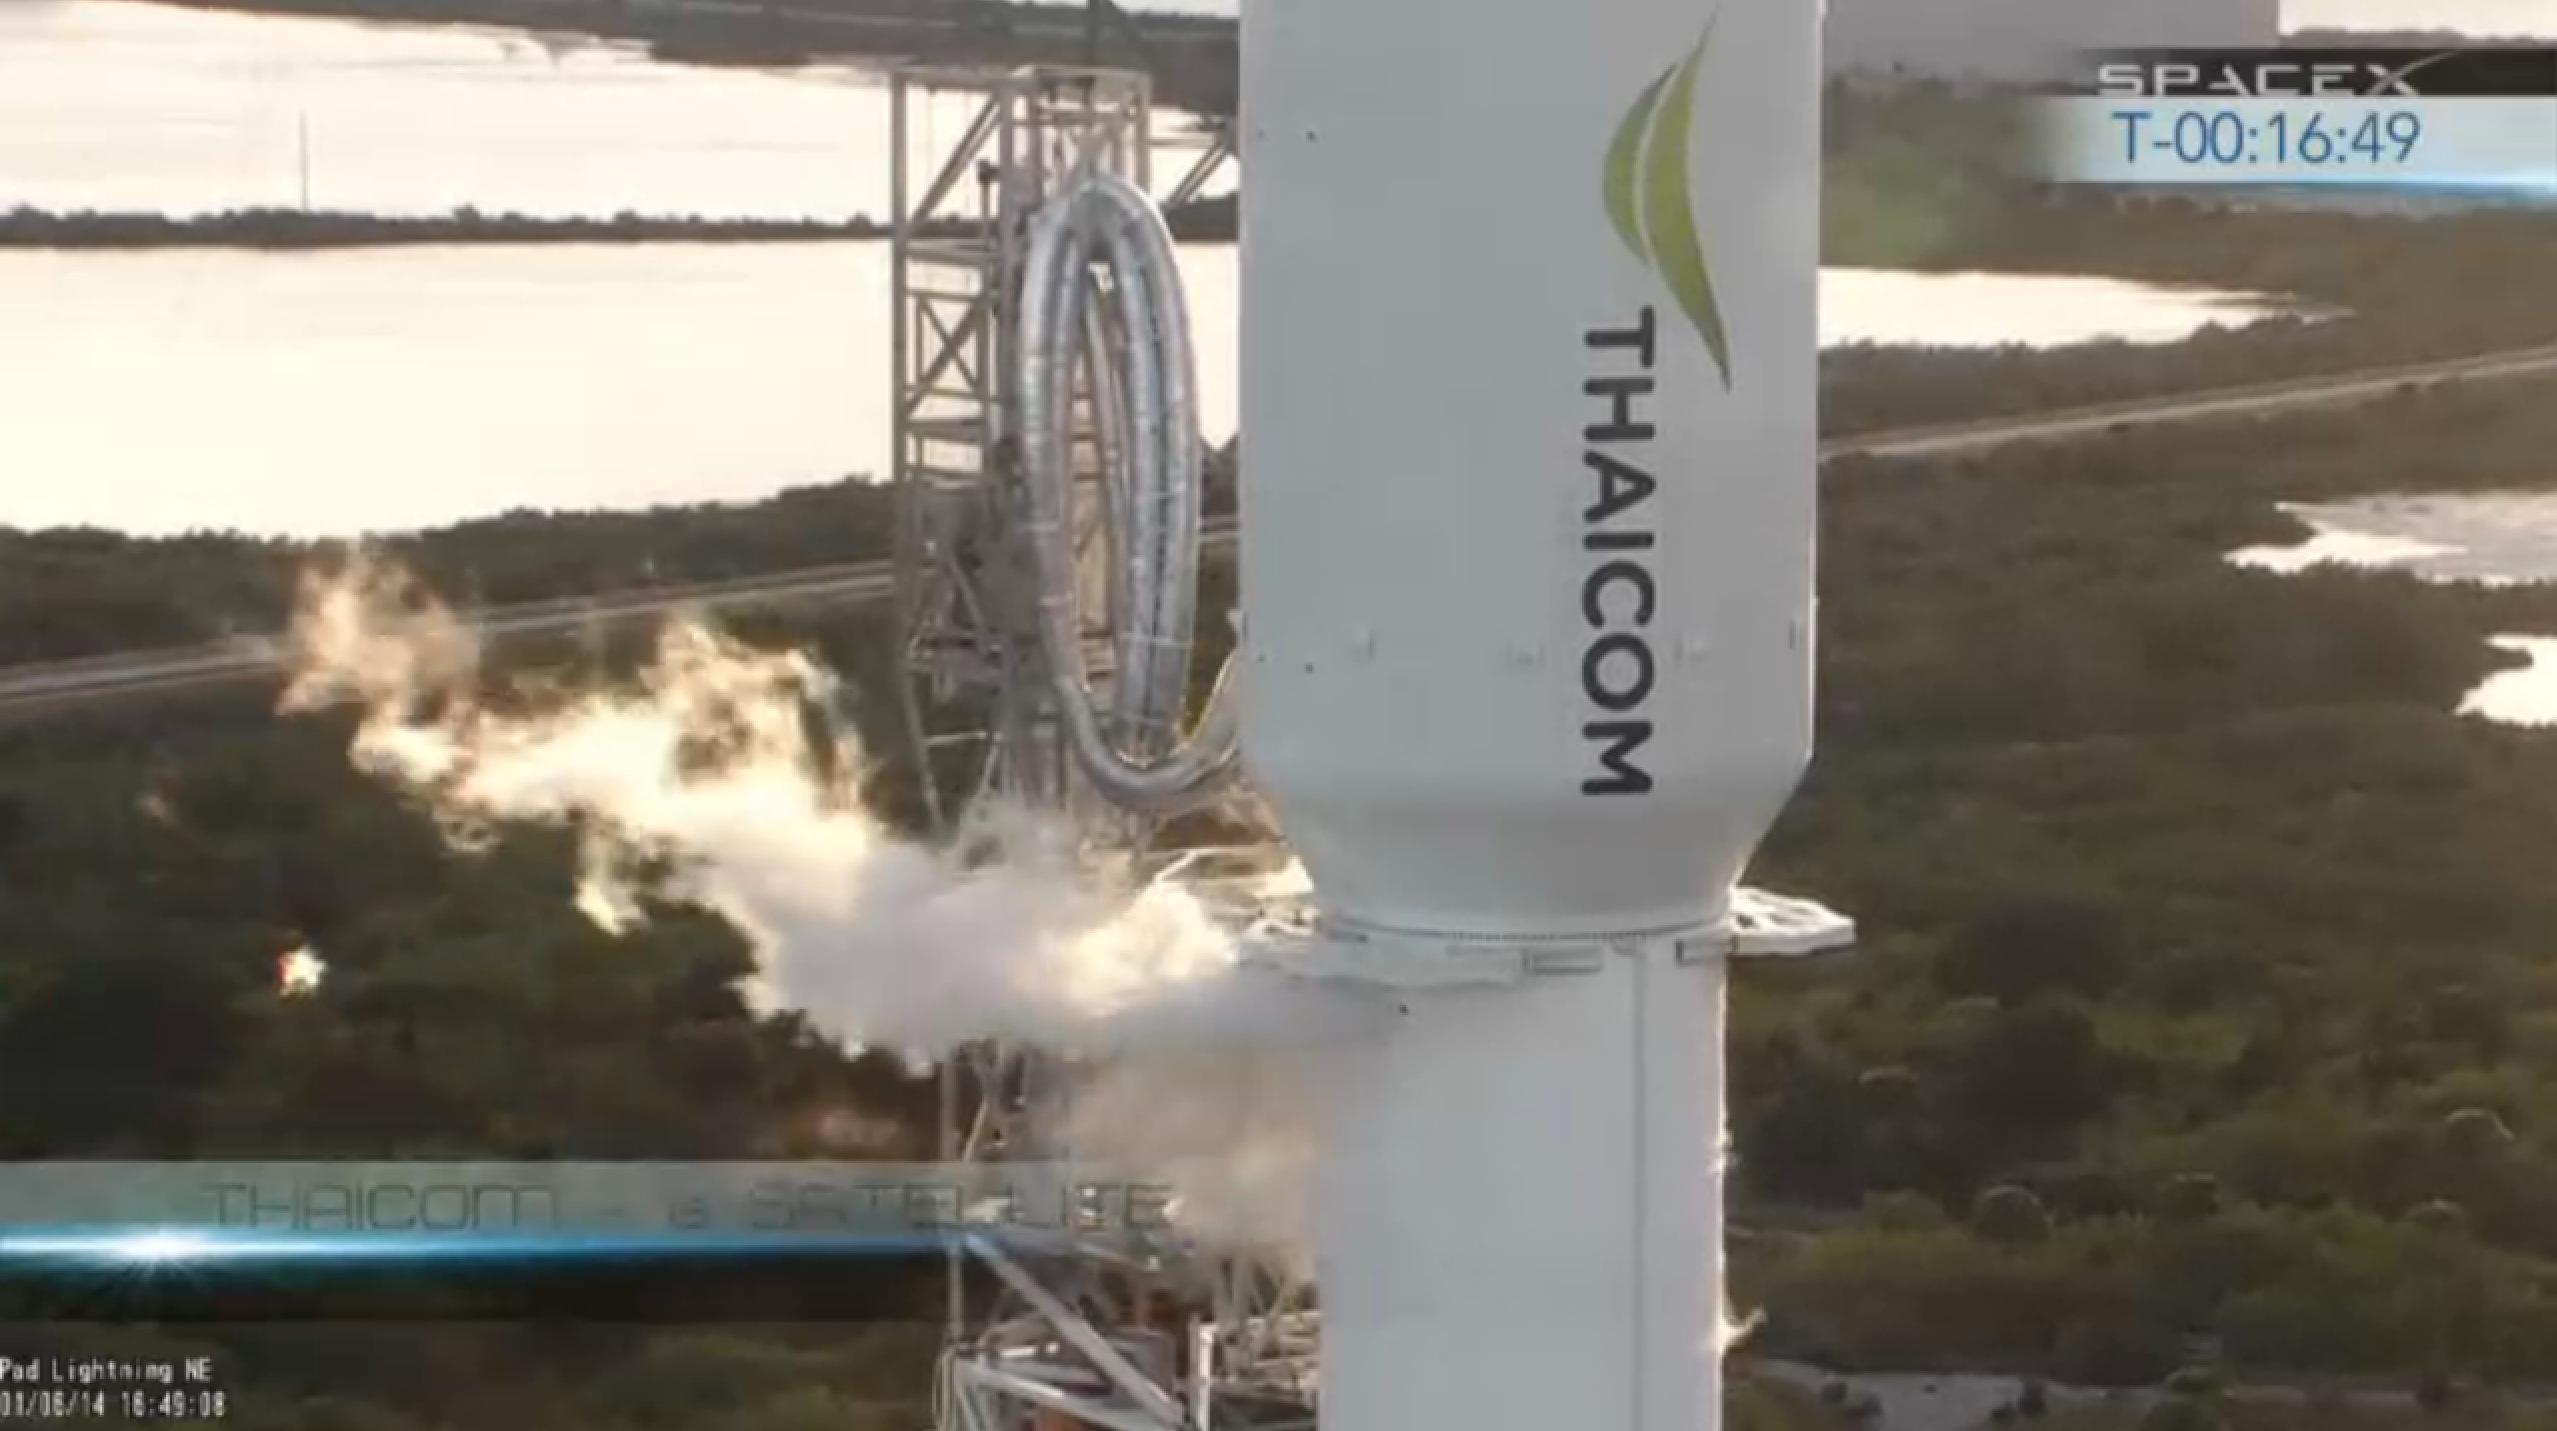 SpaceX Falcon 9 Preparing to Launch THAICOM 6